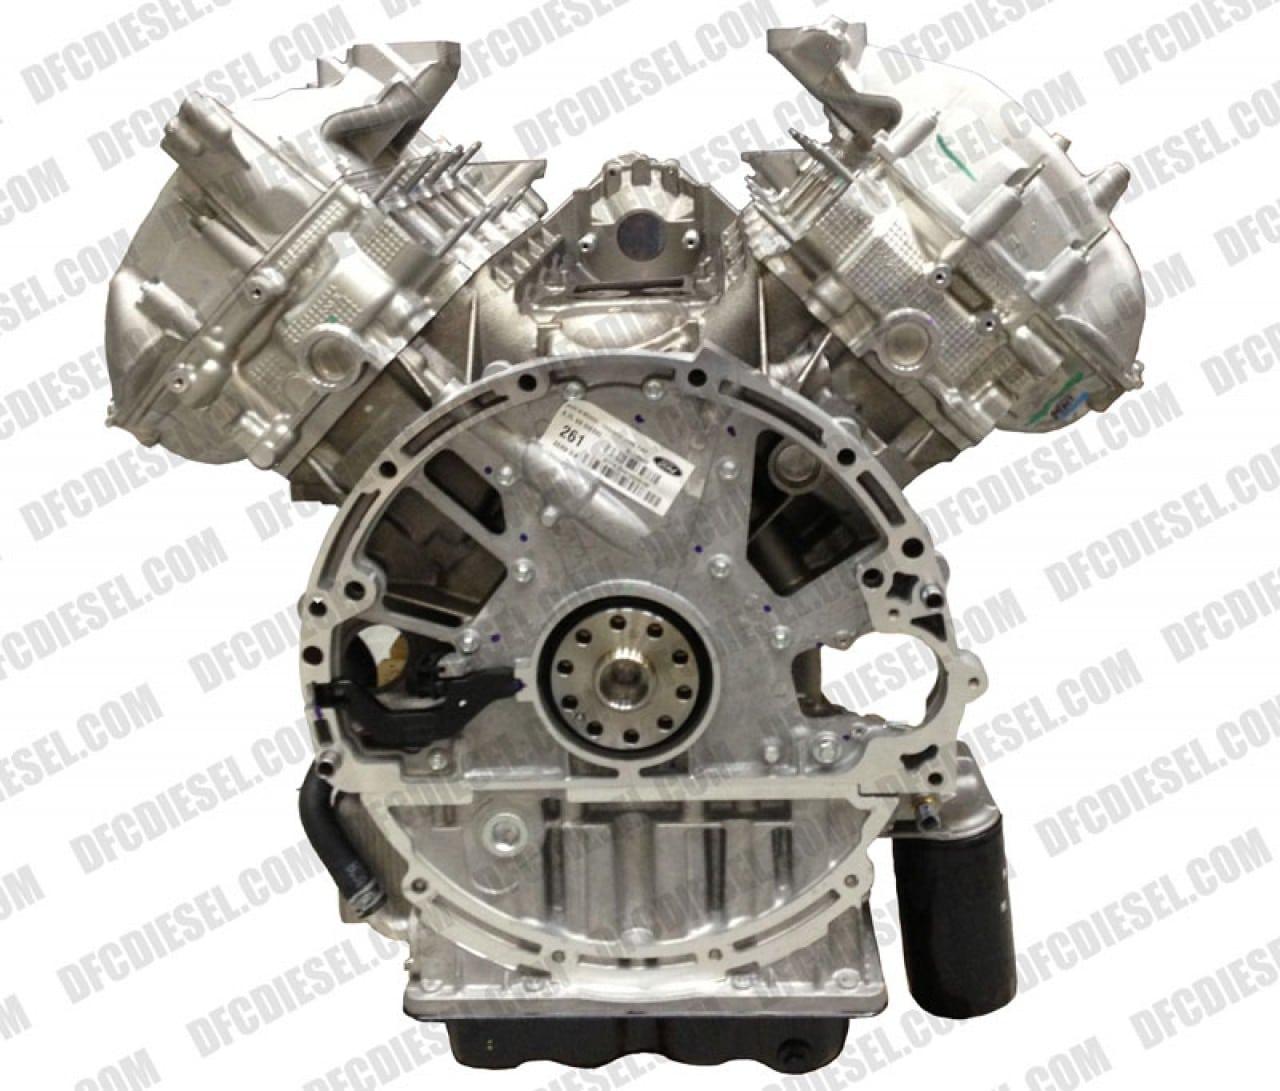 ford 7 3 diesel engine diagram focus wiring 2005 6 7l powerstroke free image for user